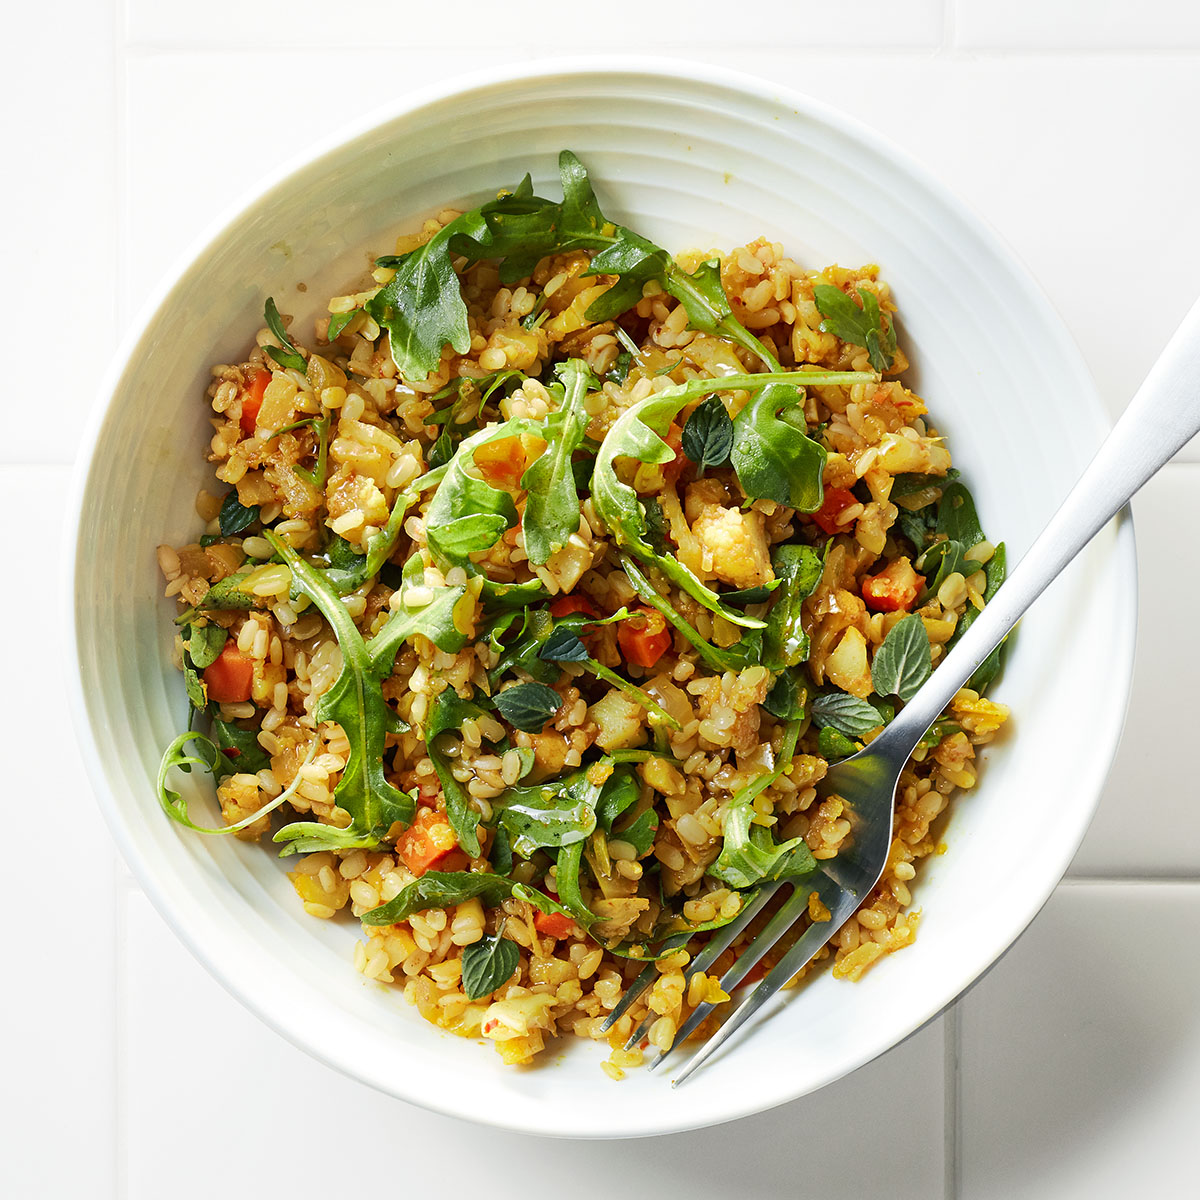 Curry Cauliflower Couscous with Lentils & Arugula